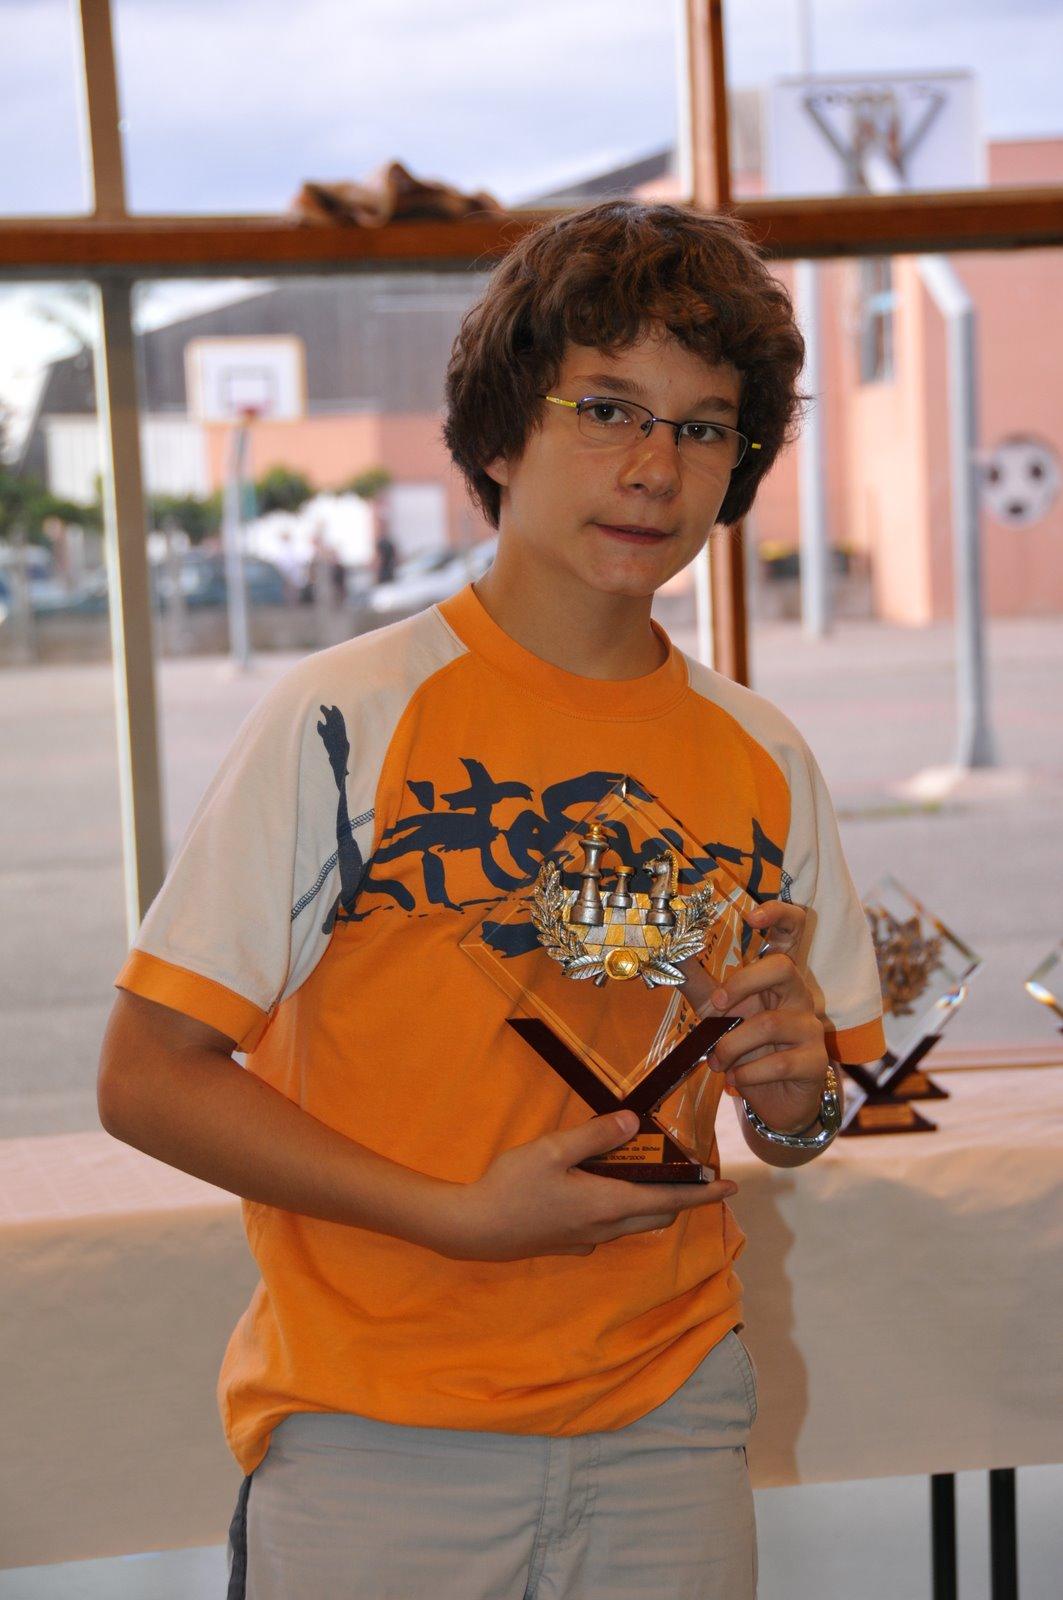 TJC_Podium_Grand_prix-08.JPG